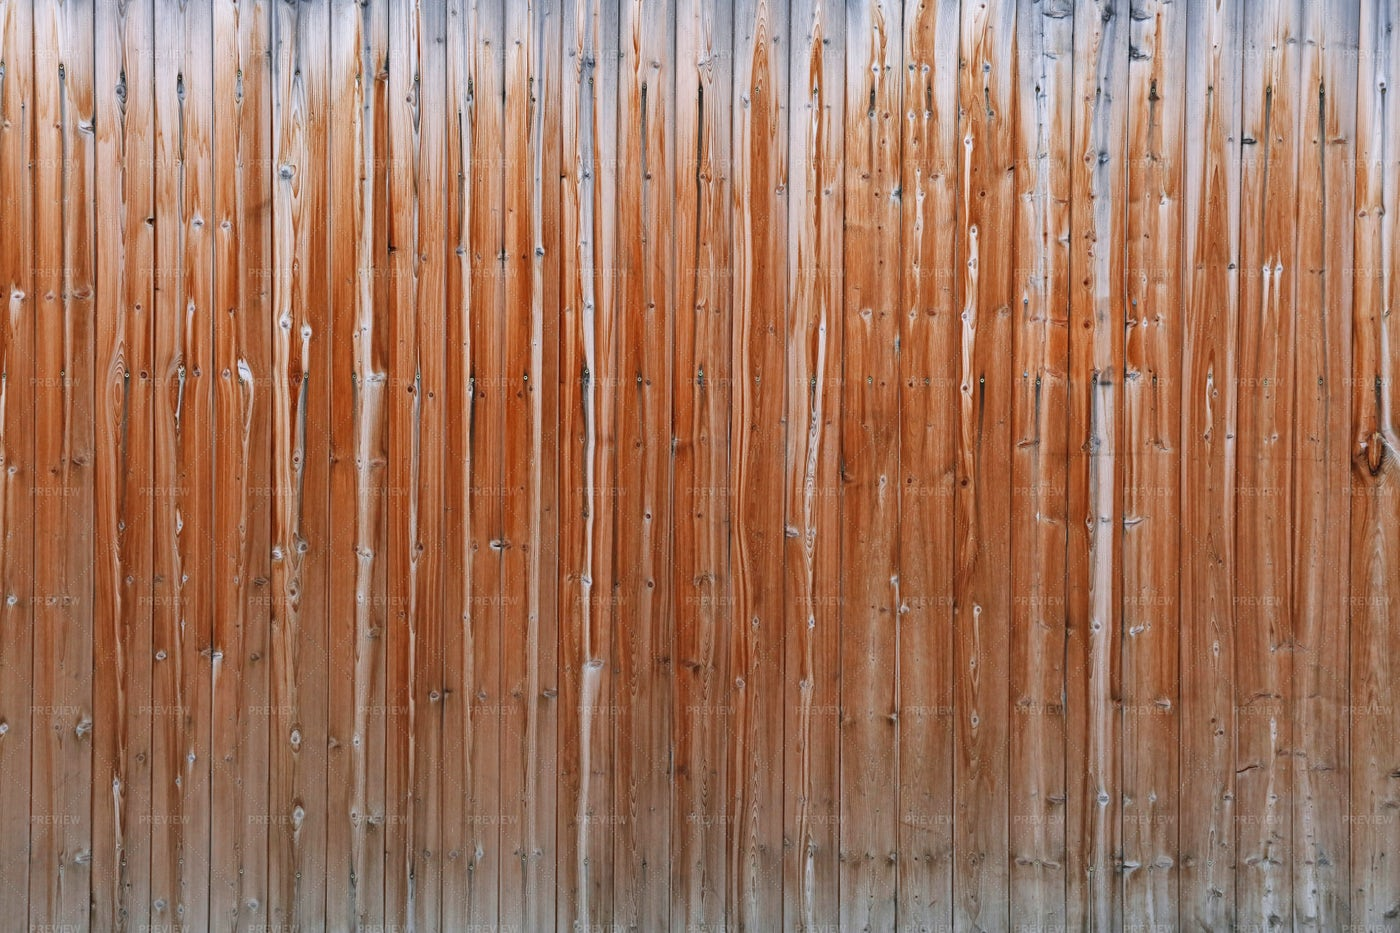 Weathered Wood: Stock Photos